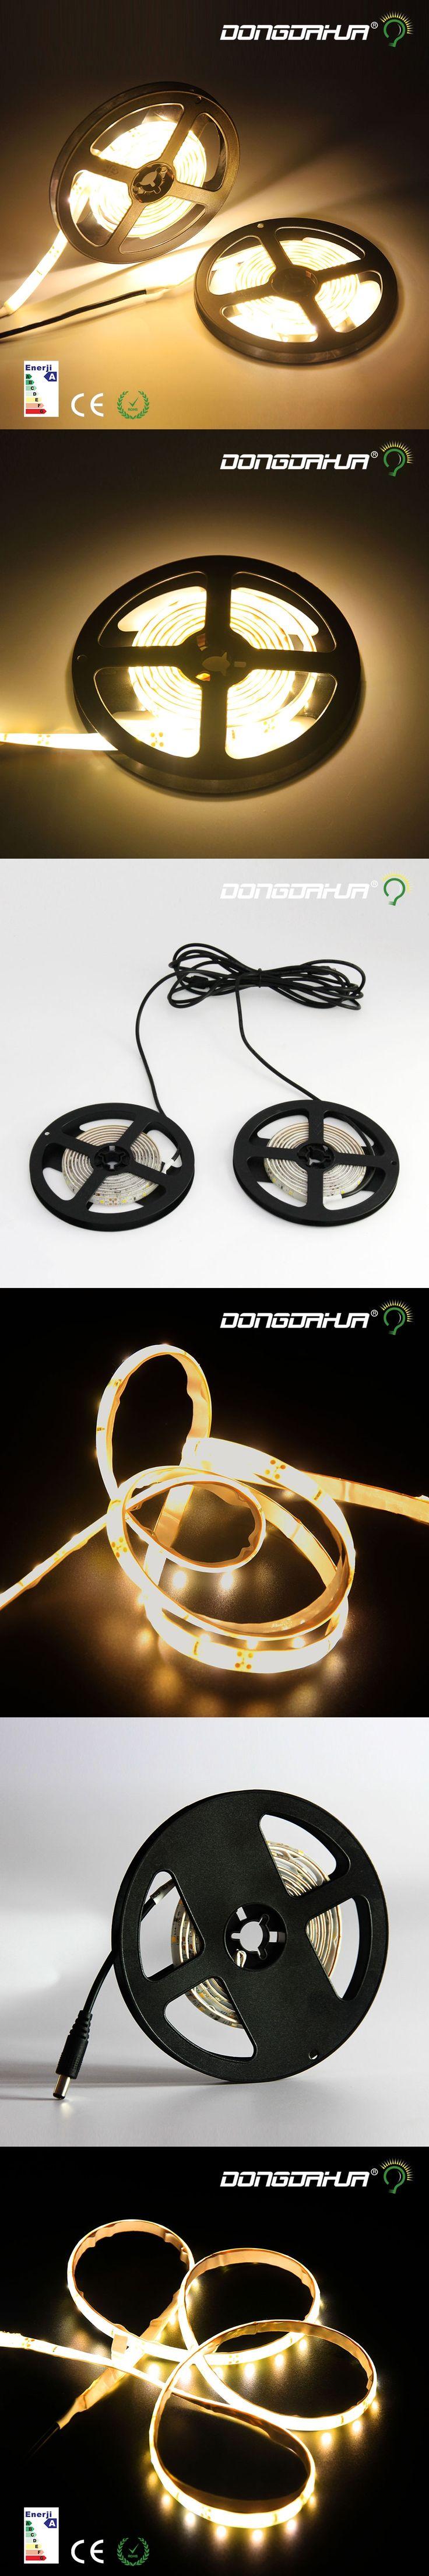 1 pack high luminous flux 2835 smd 1.5 m led strip light brighter lowest price decorating lamp string ribbon Longevity